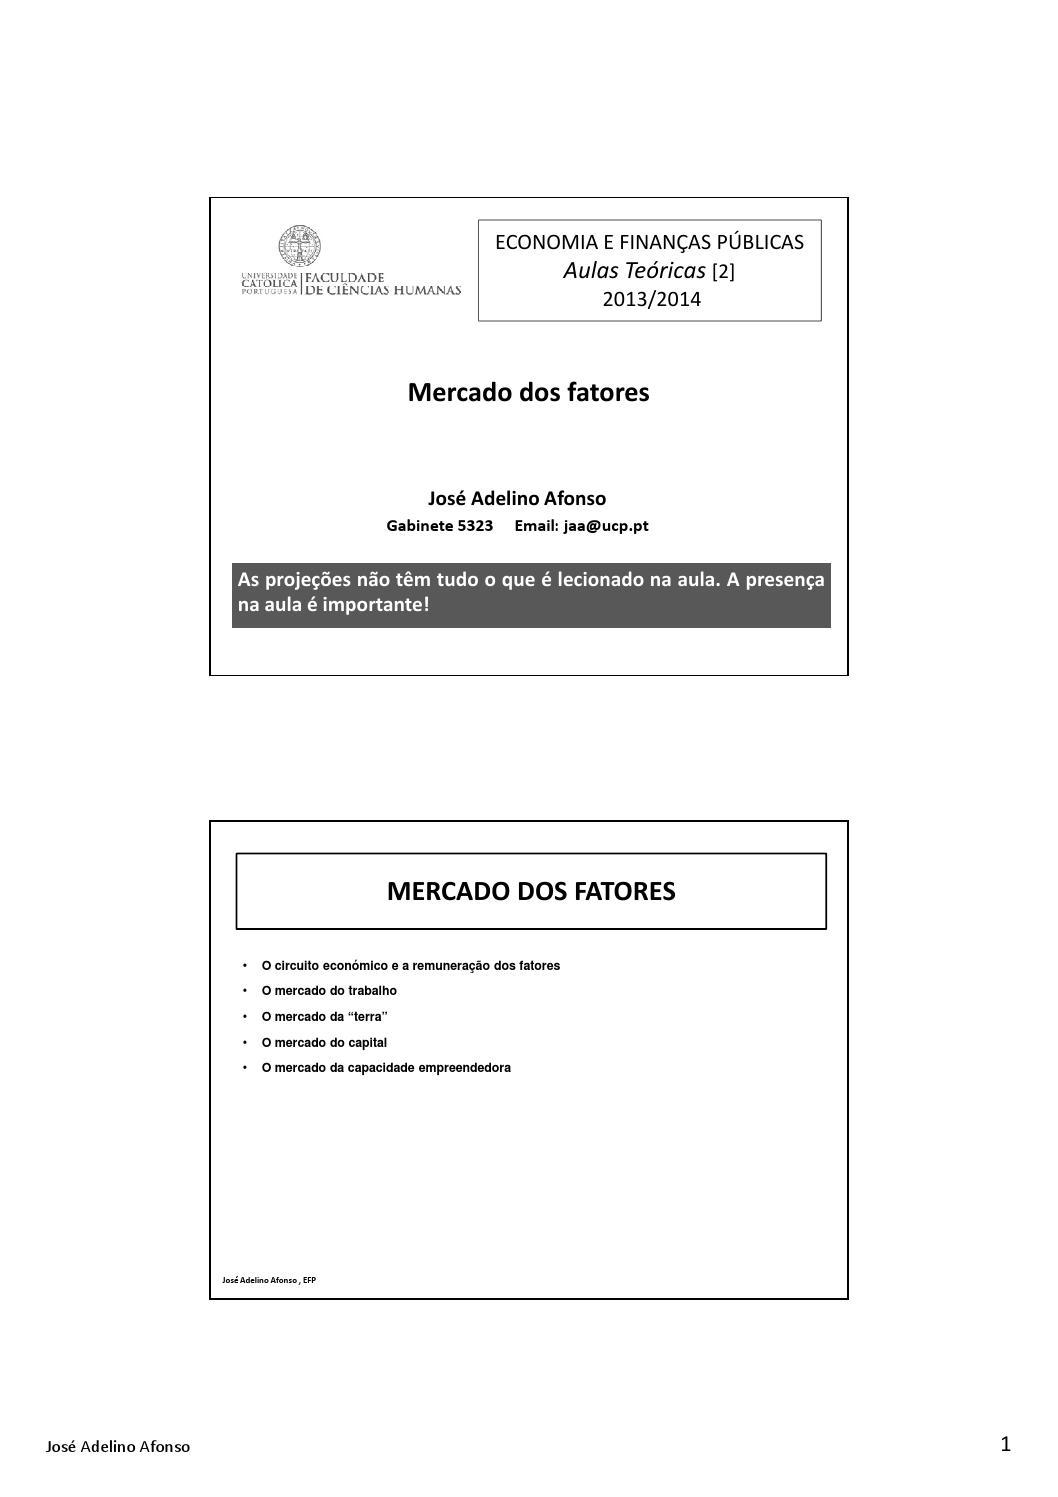 Circuito Economico : Circuito económico e mercado dos factores by david machado issuu